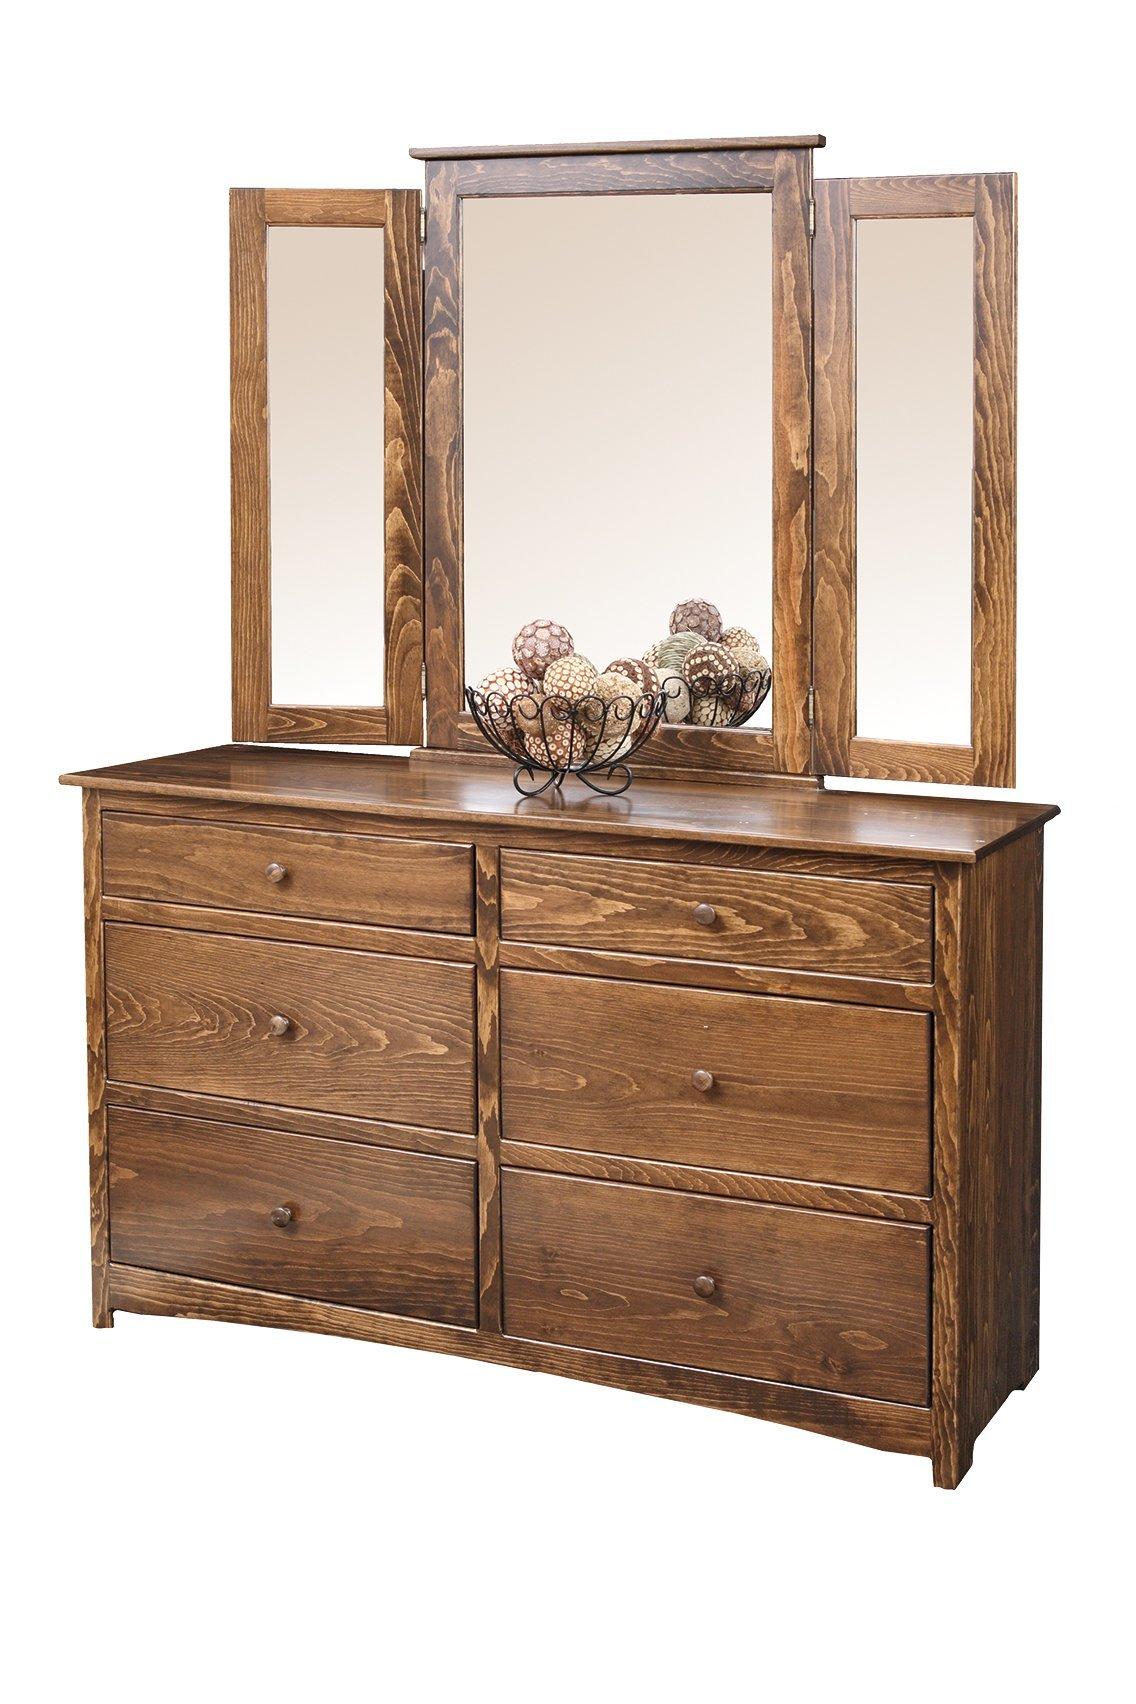 Shaker Pine Wood Dresser With Mirror